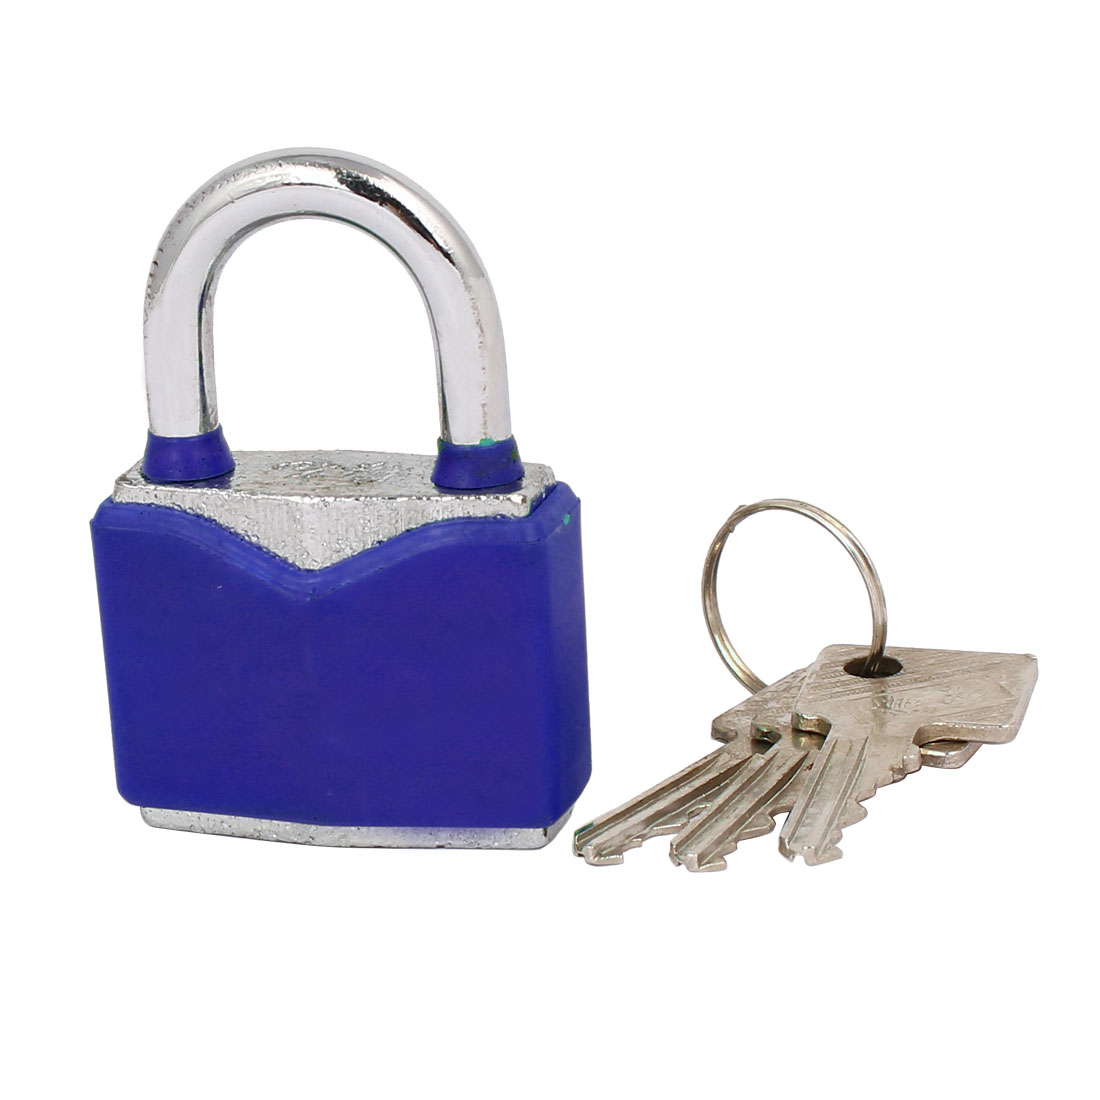 Tool Box Cabinet Metal Safety Locker Padlock 61x43x19mm w Keys